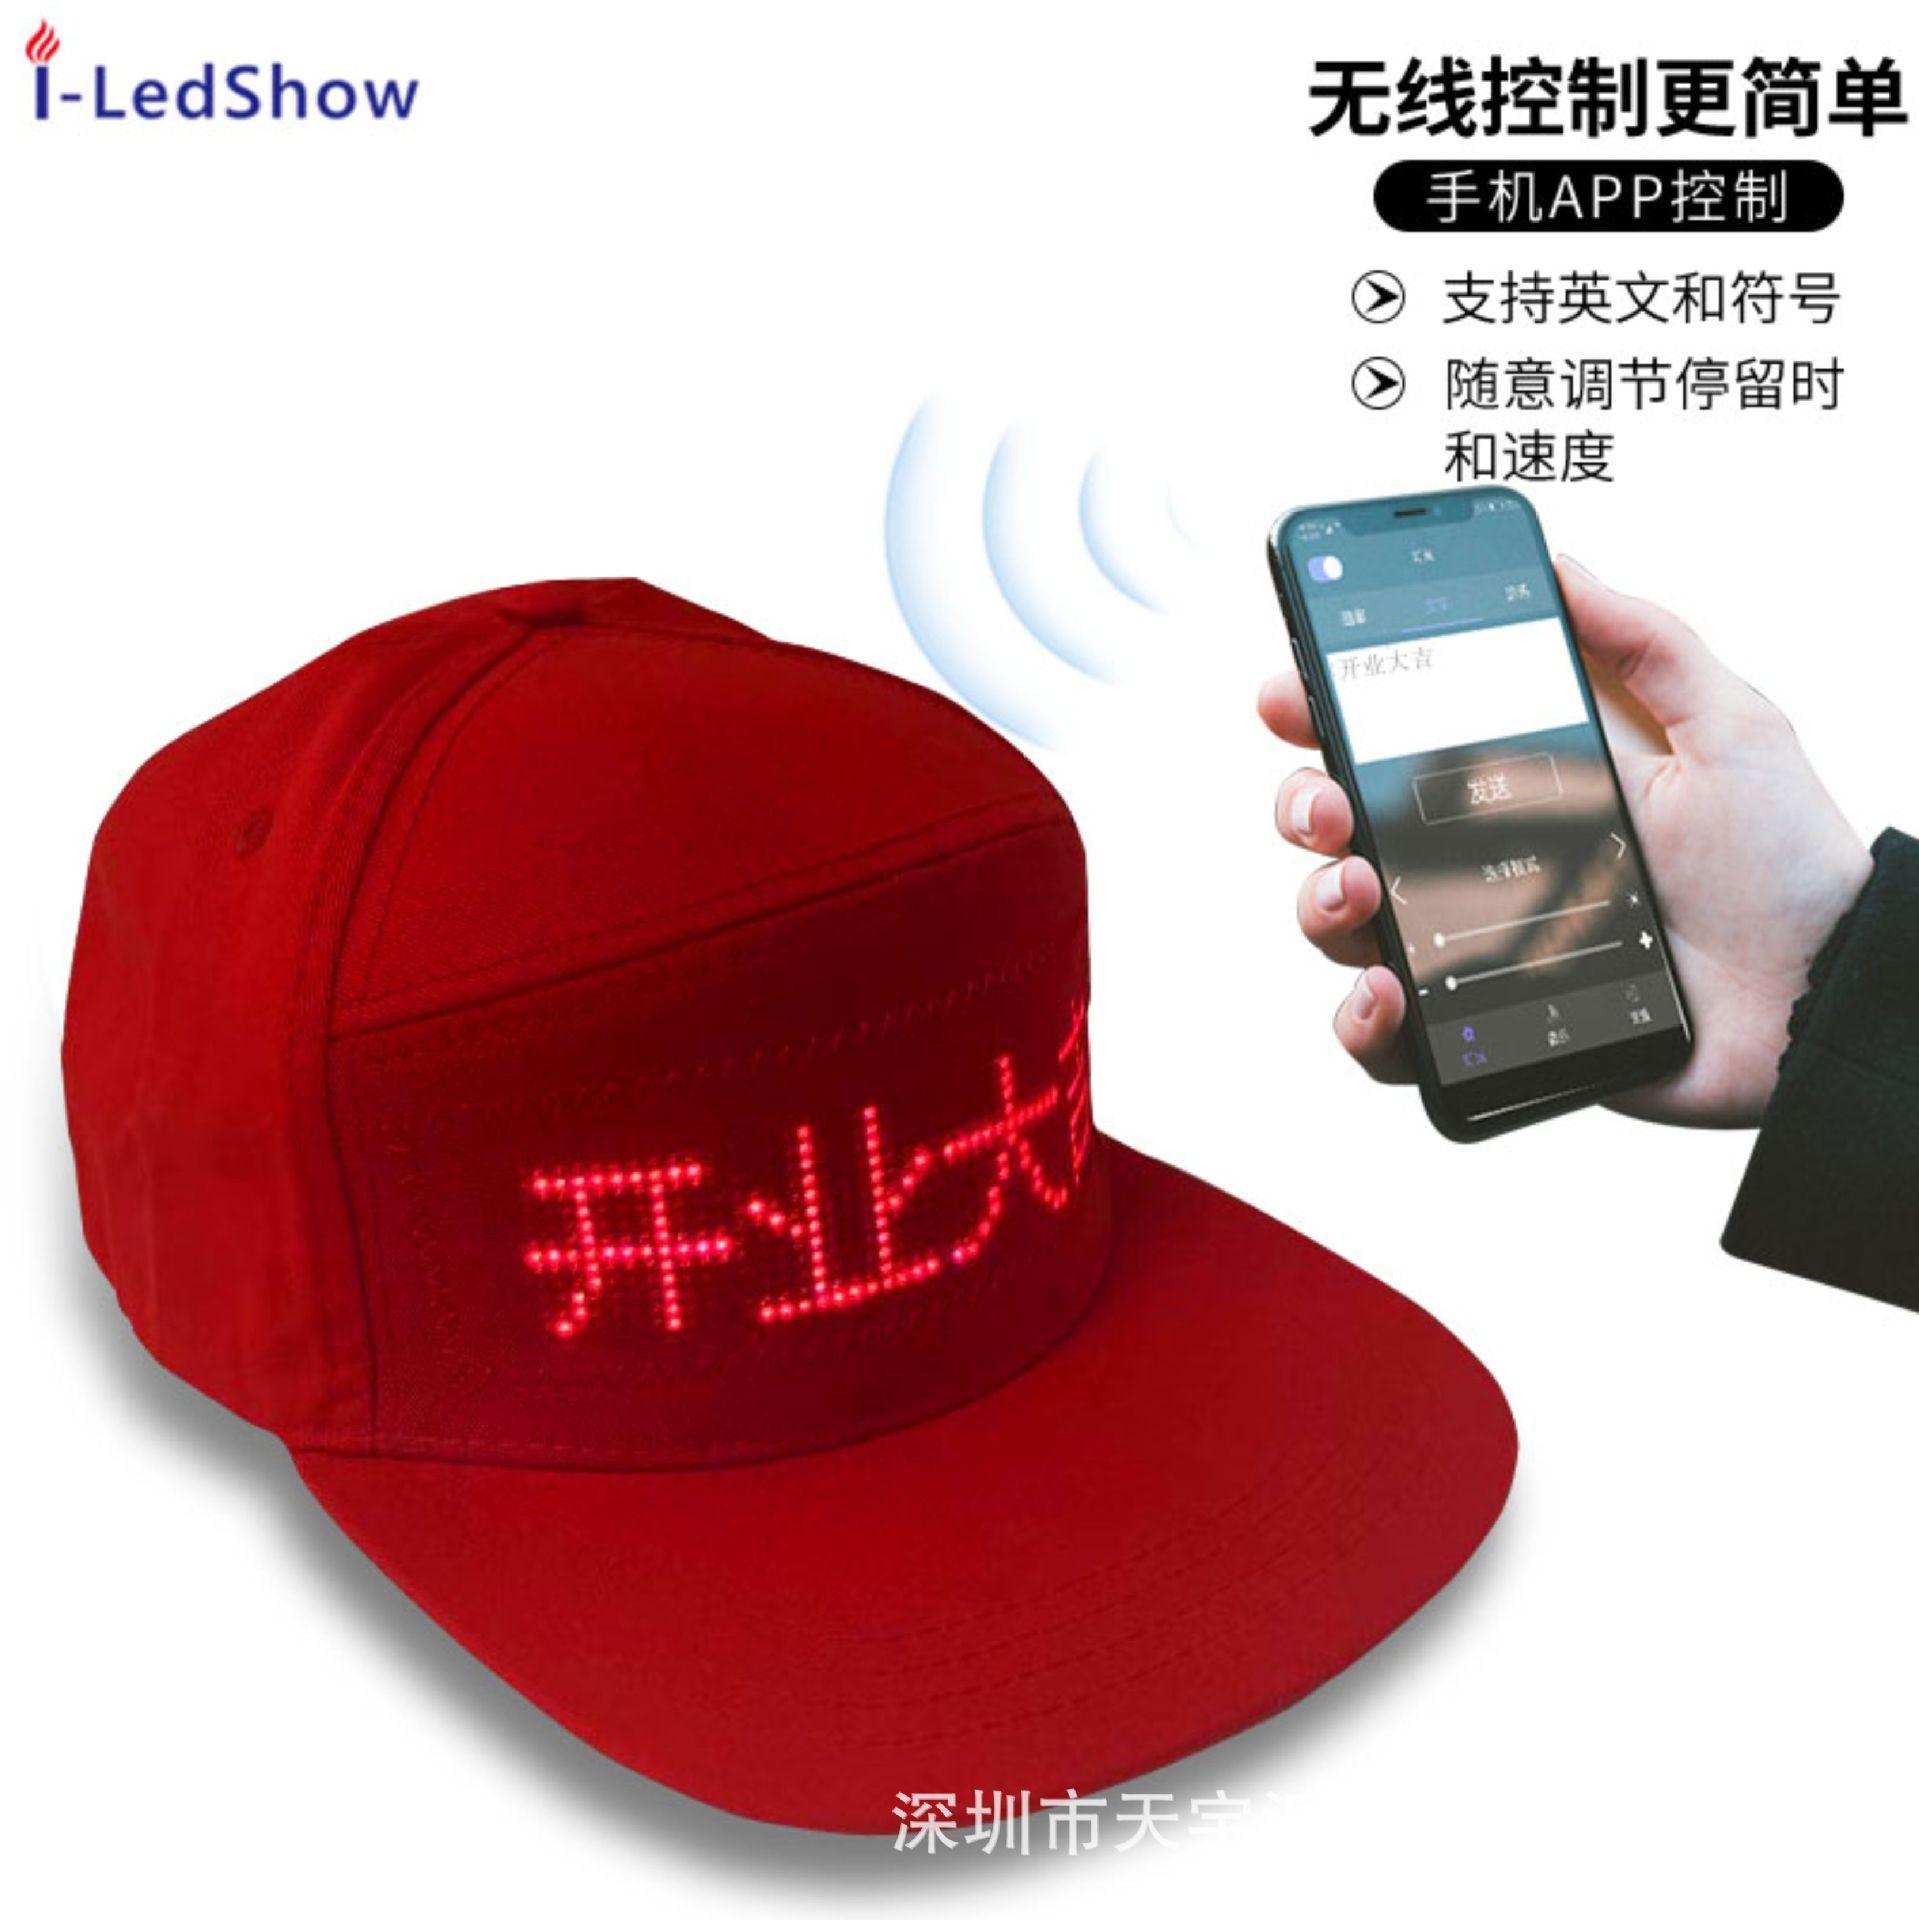 LED发光帽多语言广告帽 工厂直销手机APP控制内置LED迷你显示走字